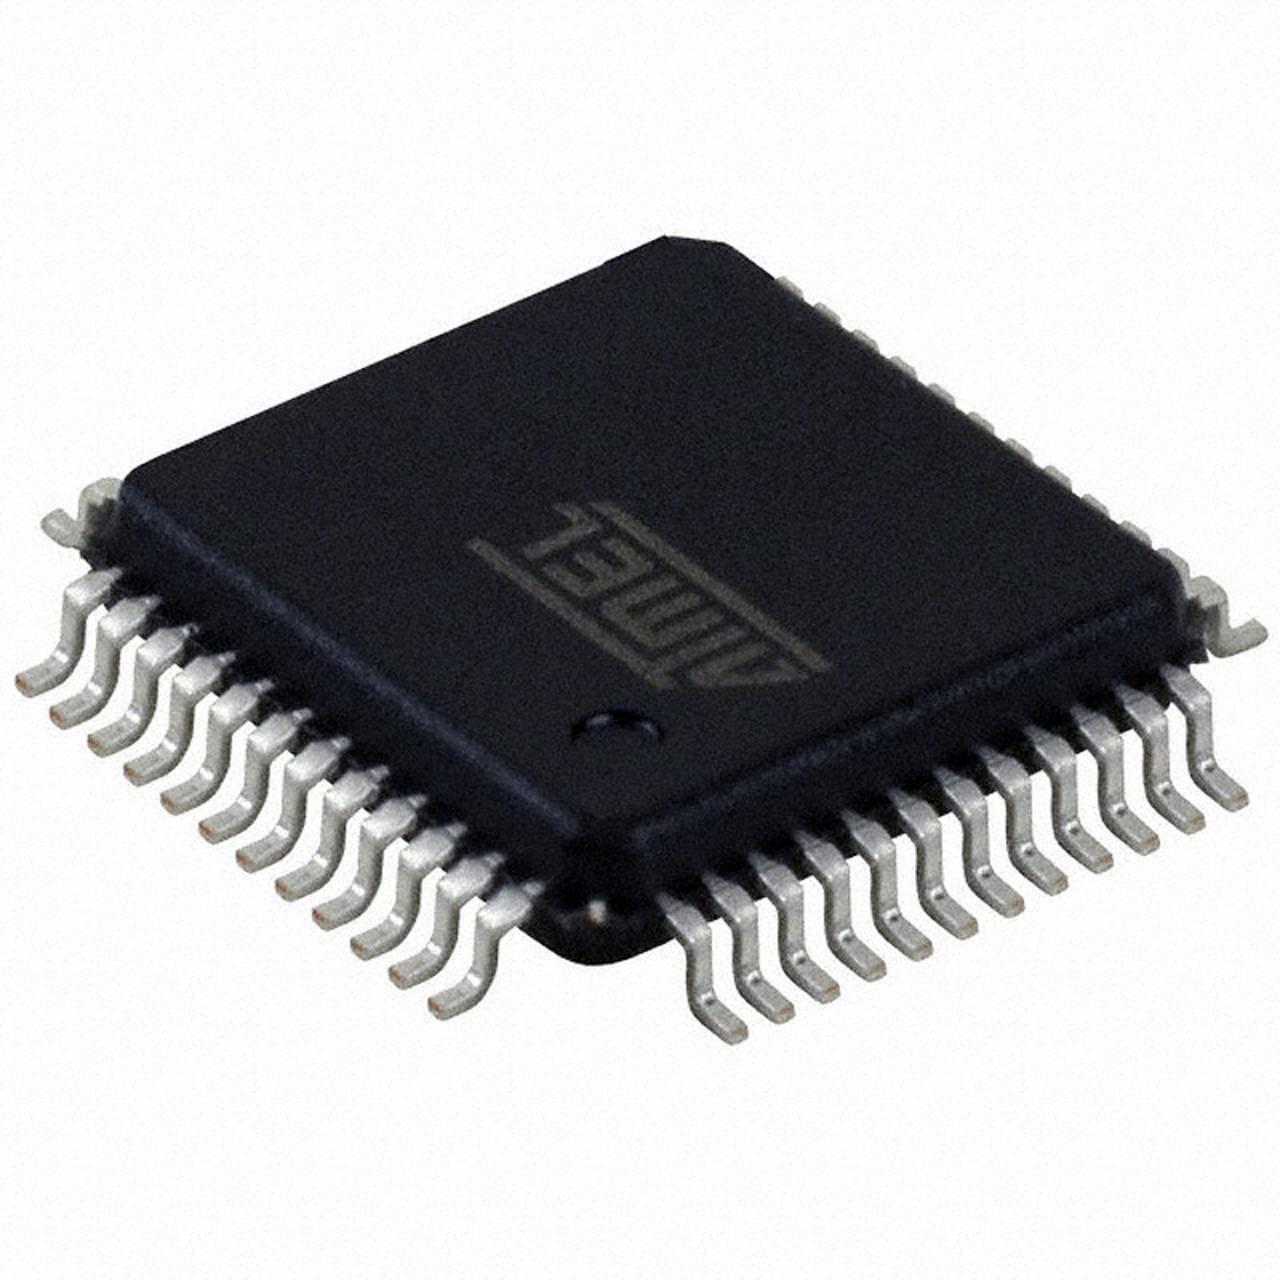 Atmel Mikrocontroller AT32UC3L032-AUT- TQFP-48